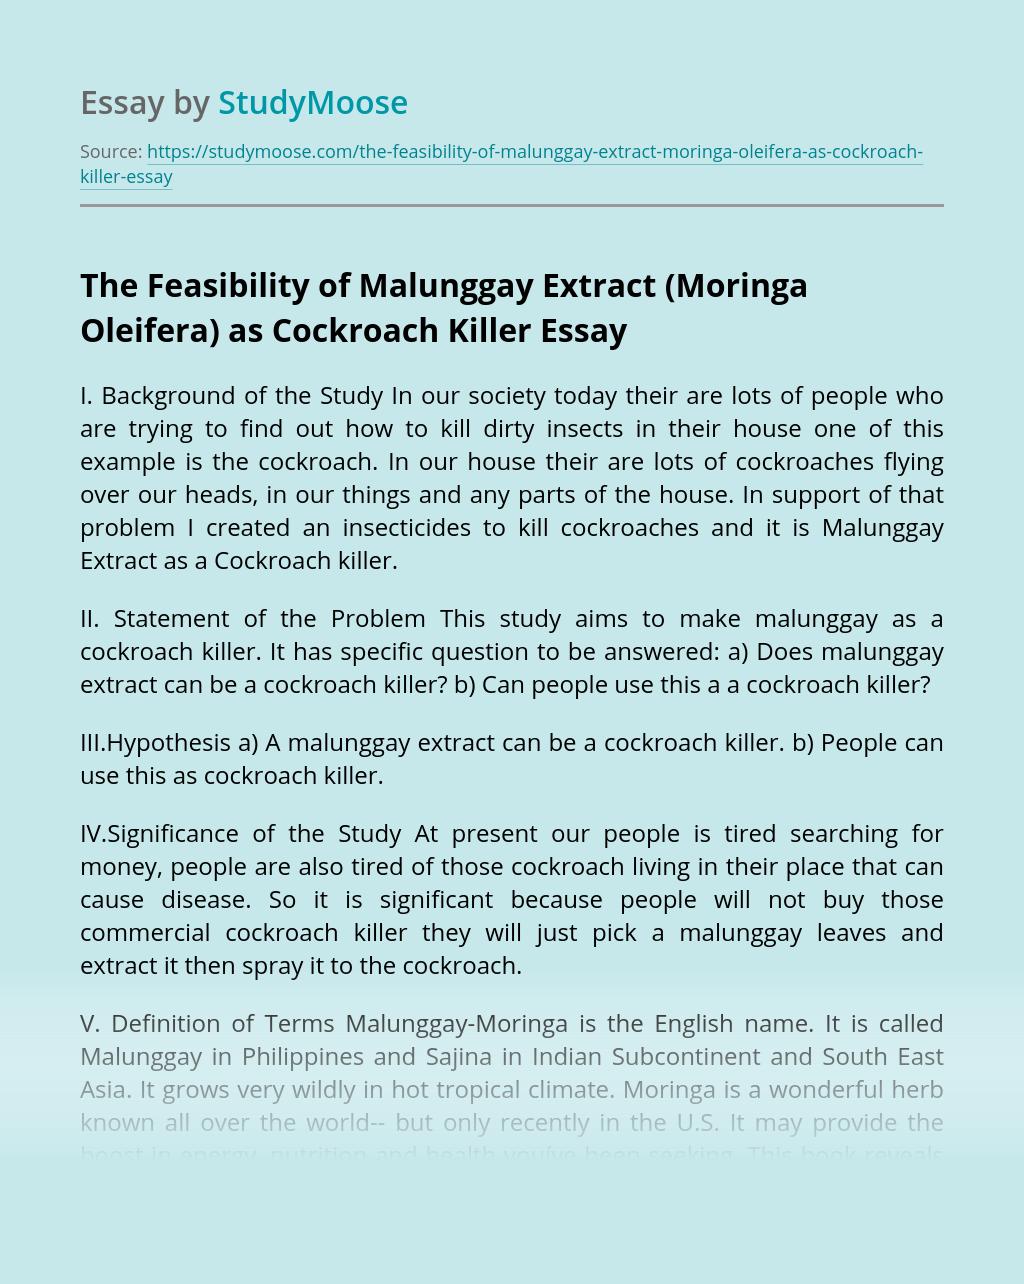 The Feasibility of Malunggay Extract (Moringa Oleifera) as Cockroach Killer